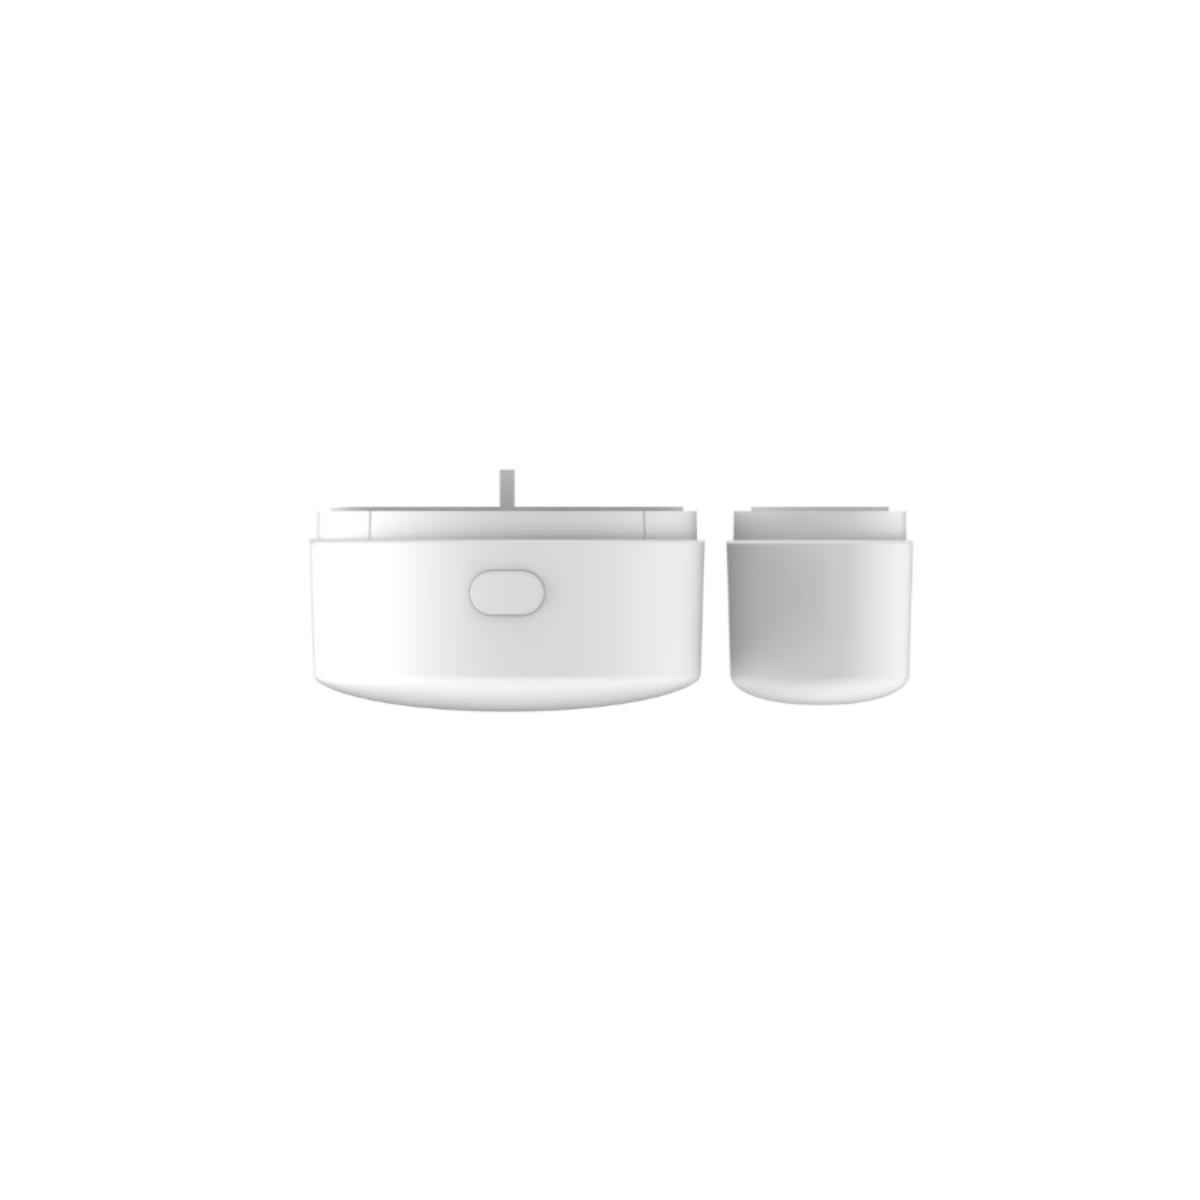 Kit 04 Sensor De Abertura Smart Intelbras Isa 1001